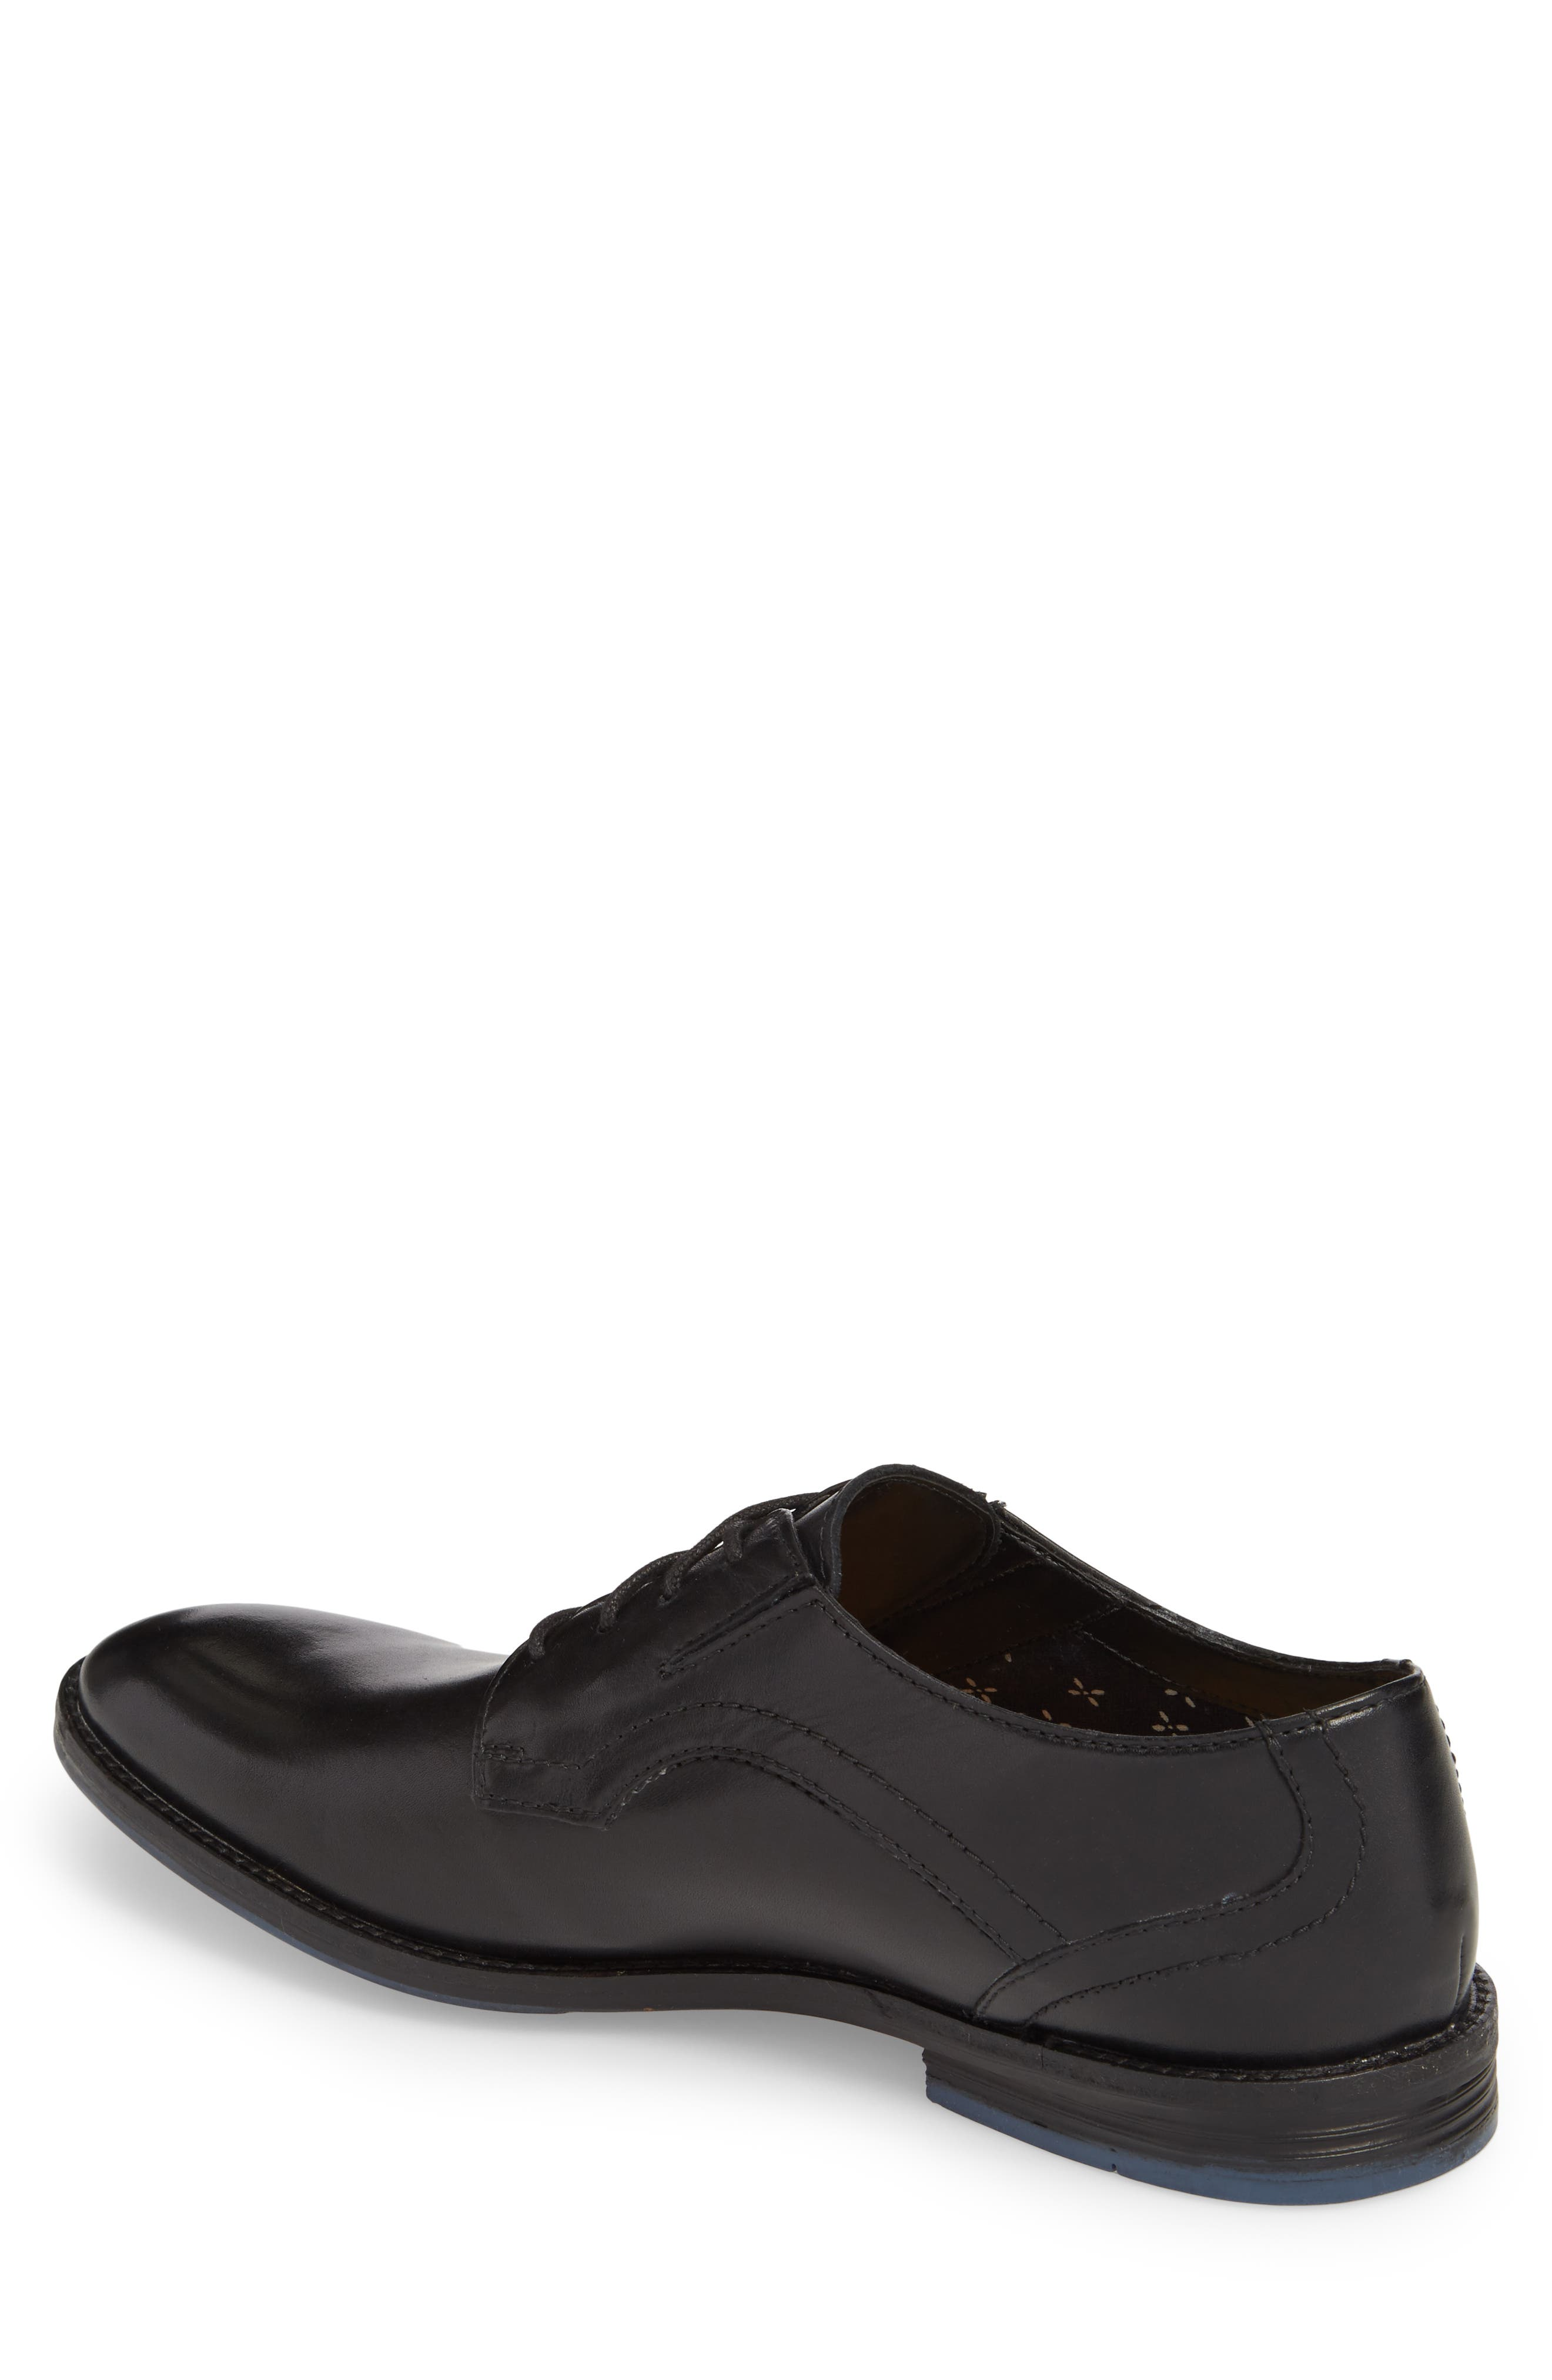 Clarks<sup>®</sup> Prangley Walk Plain Toe Derby,                             Alternate thumbnail 2, color,                             003